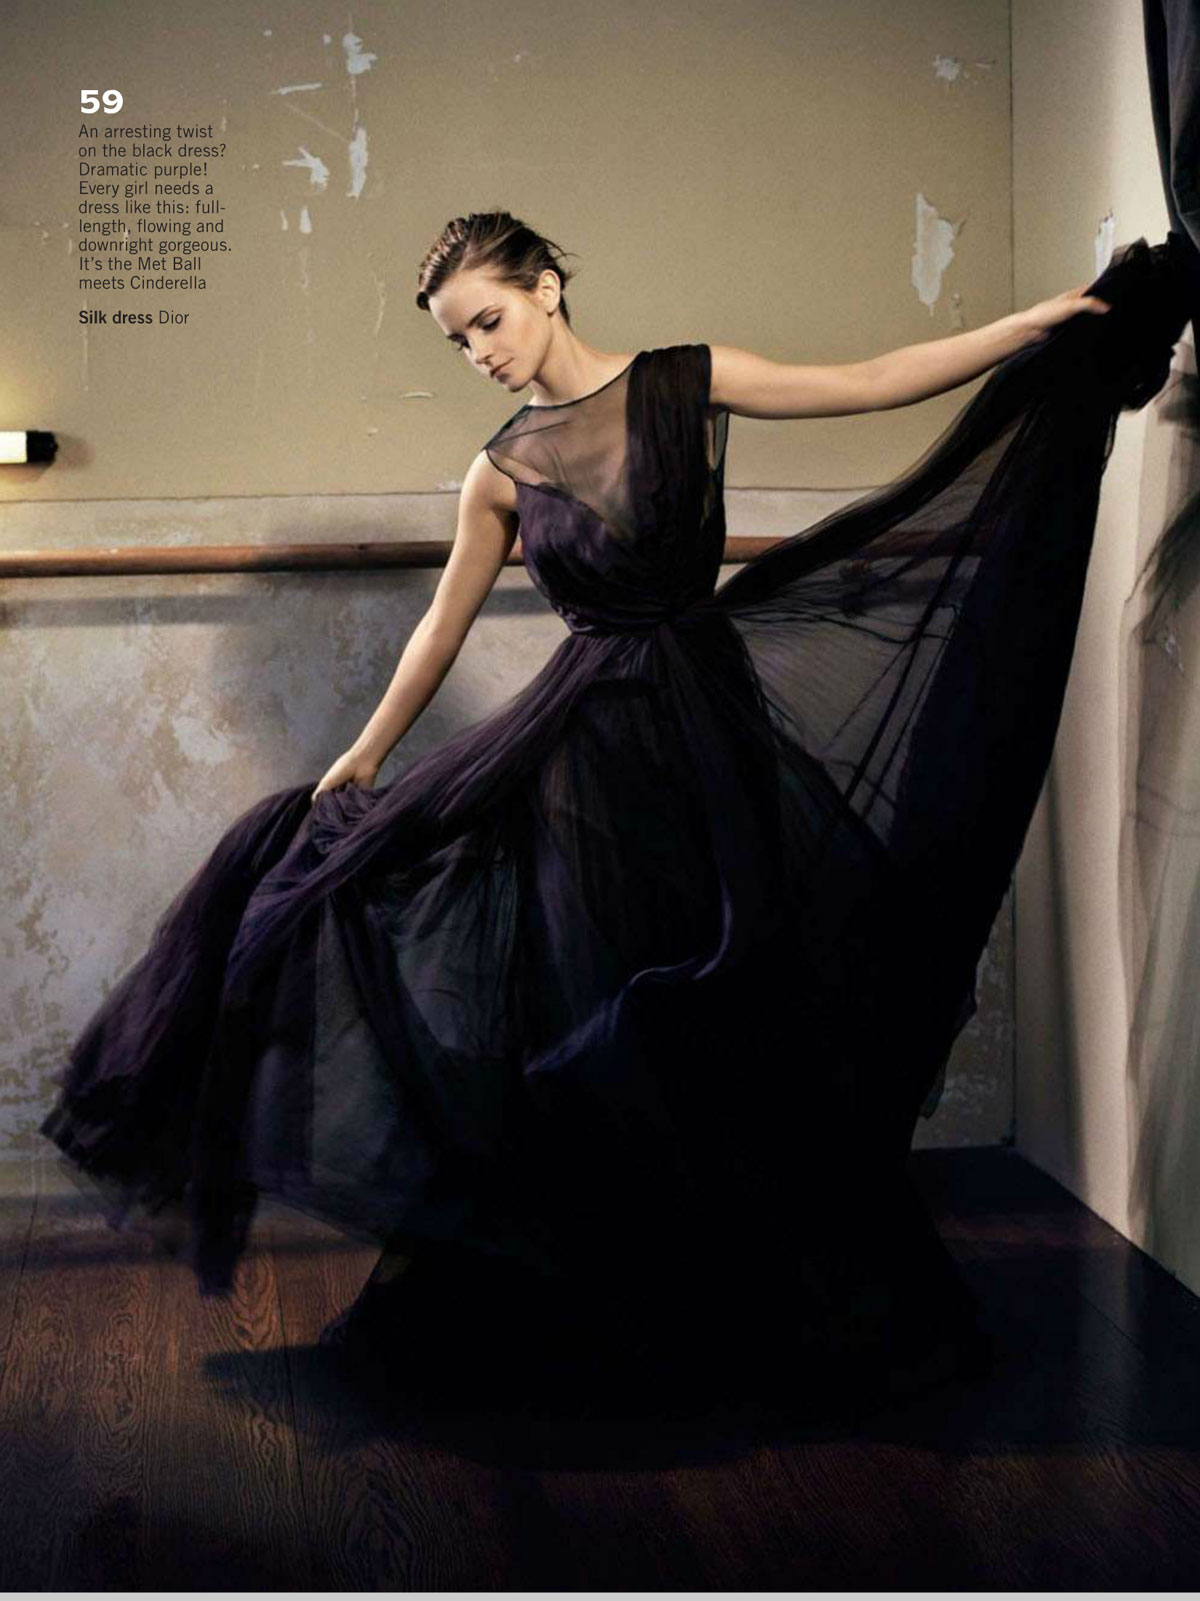 EMMA WATSON in Glamour Magazine, UK October 2012 Issue ... эмма уотсон 2017